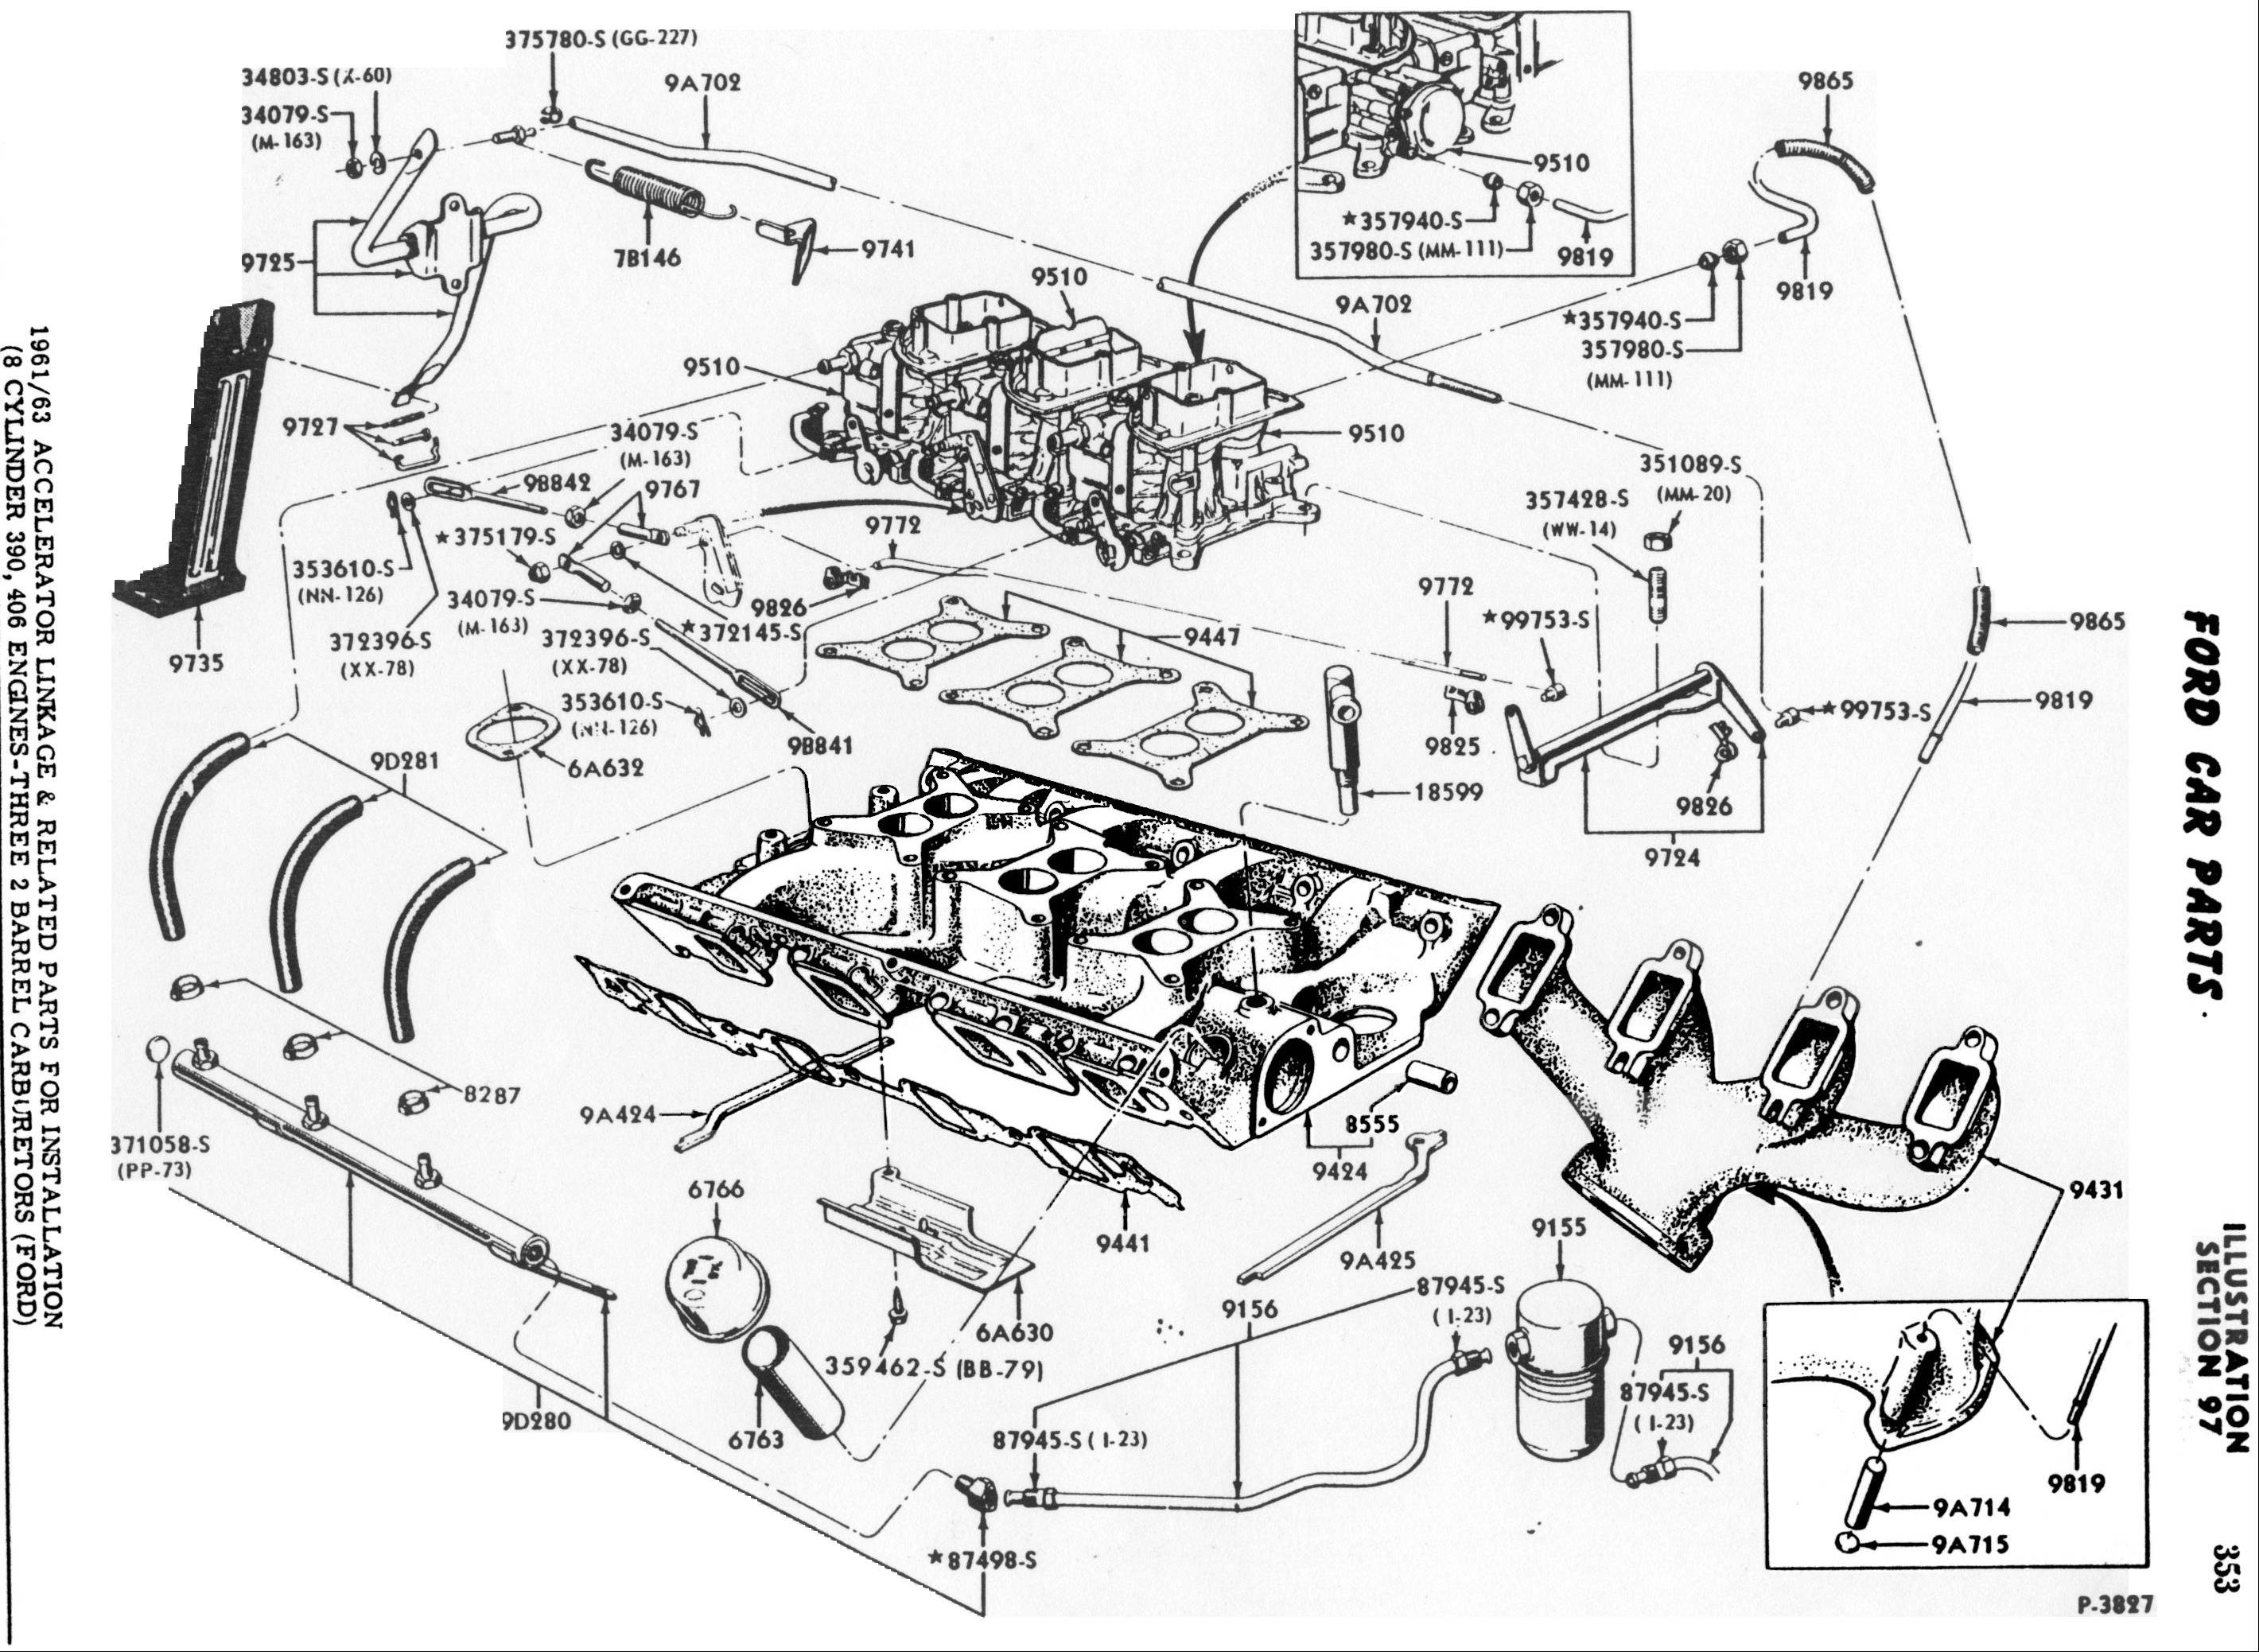 Transit Engine Diagram 460 ford Engine Diagram Wiring Info • Of Transit Engine Diagram